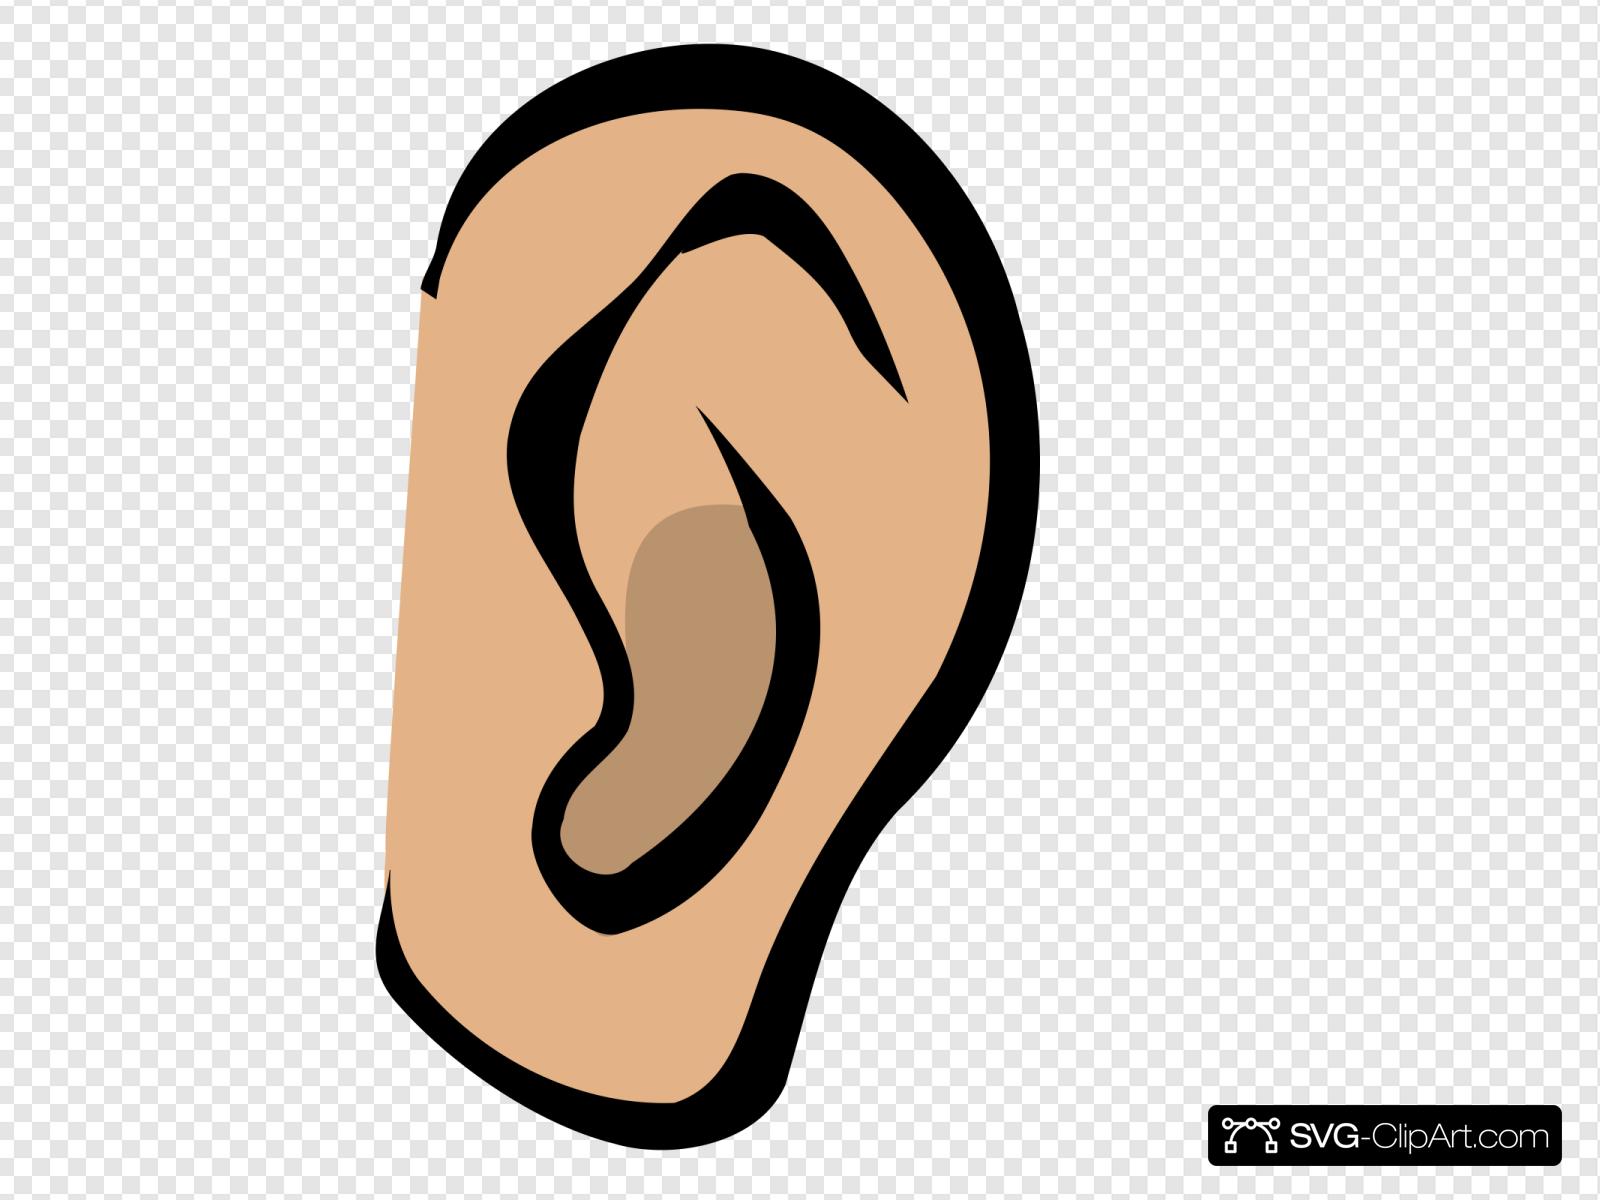 Ear clipart svg. Body part clip art